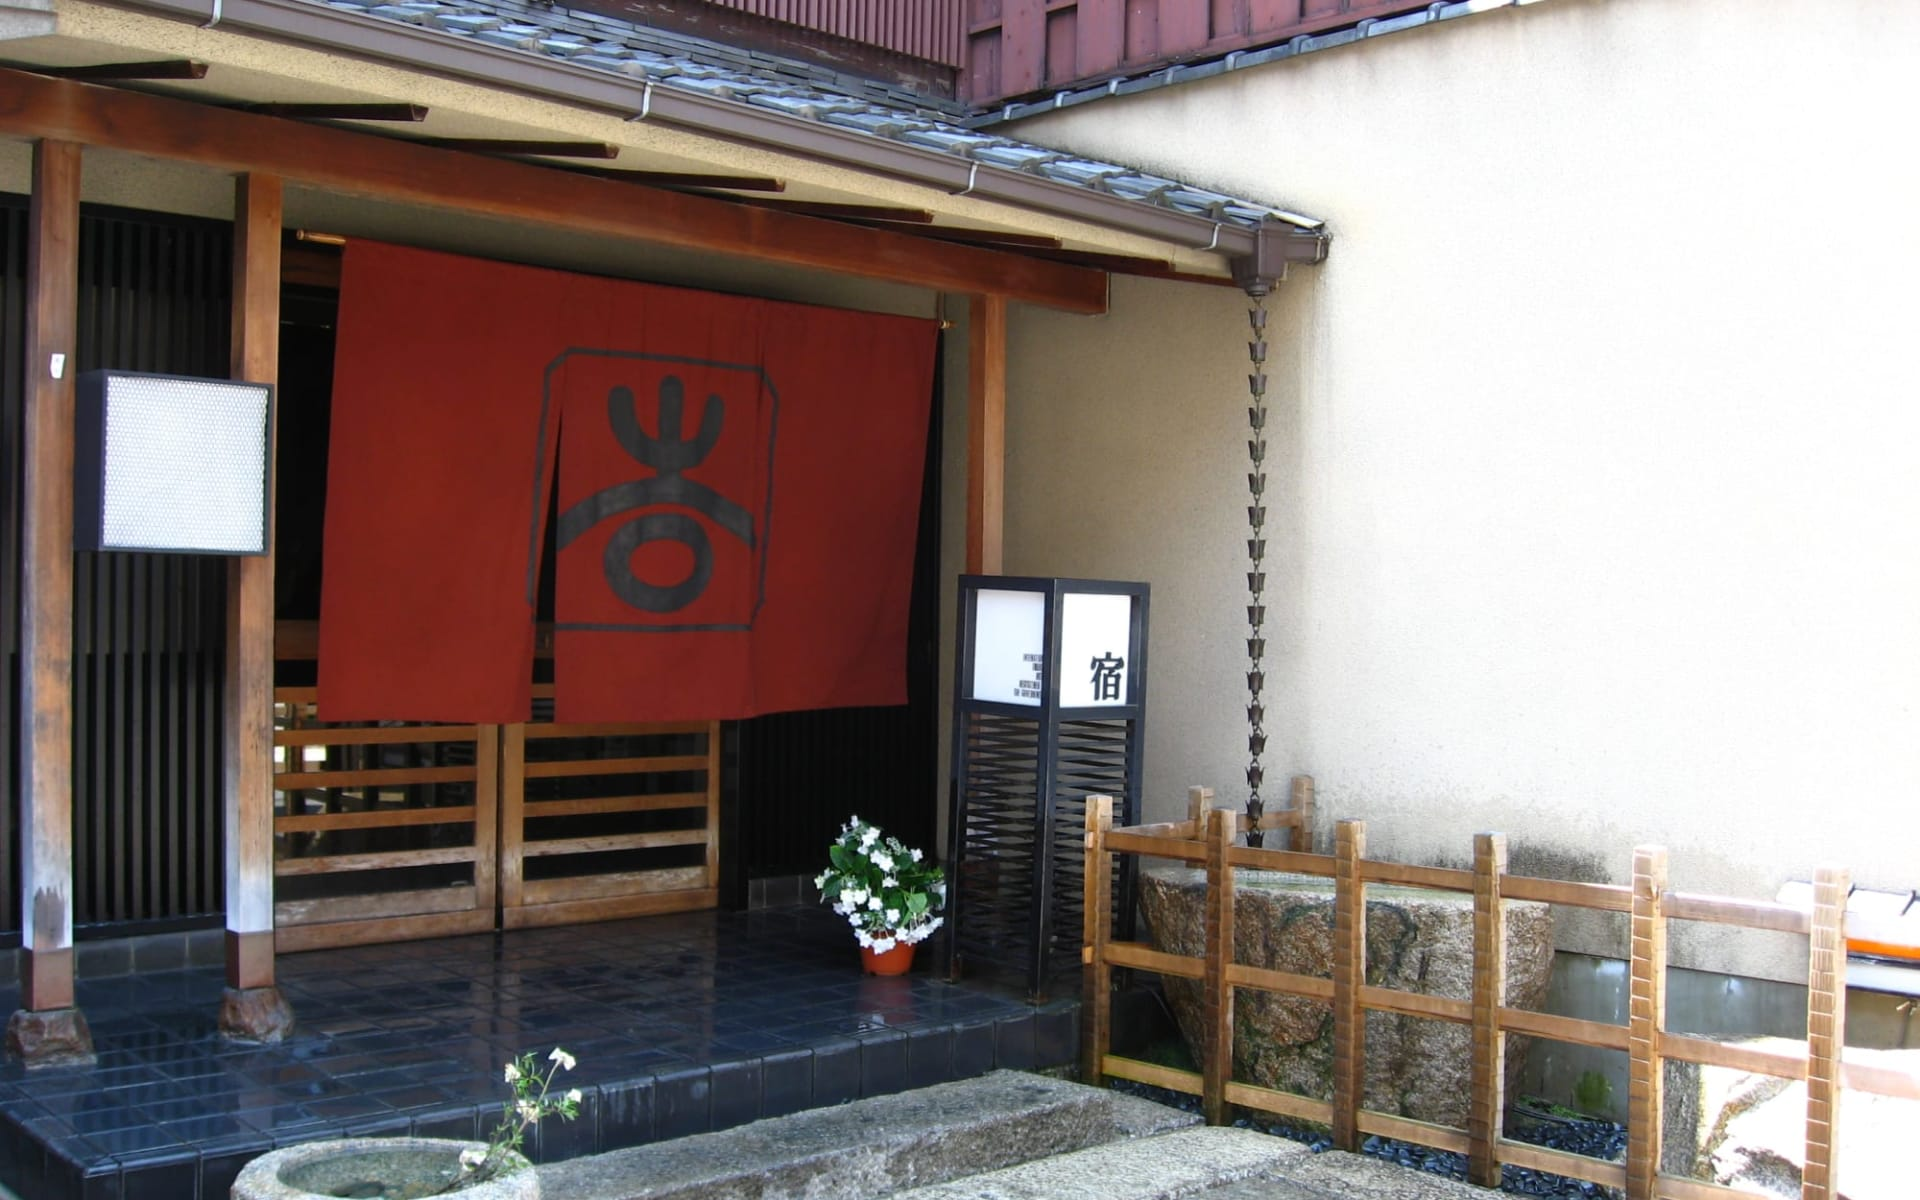 Gion Yoshi-ima Ryokan in Kyoto: Entrance